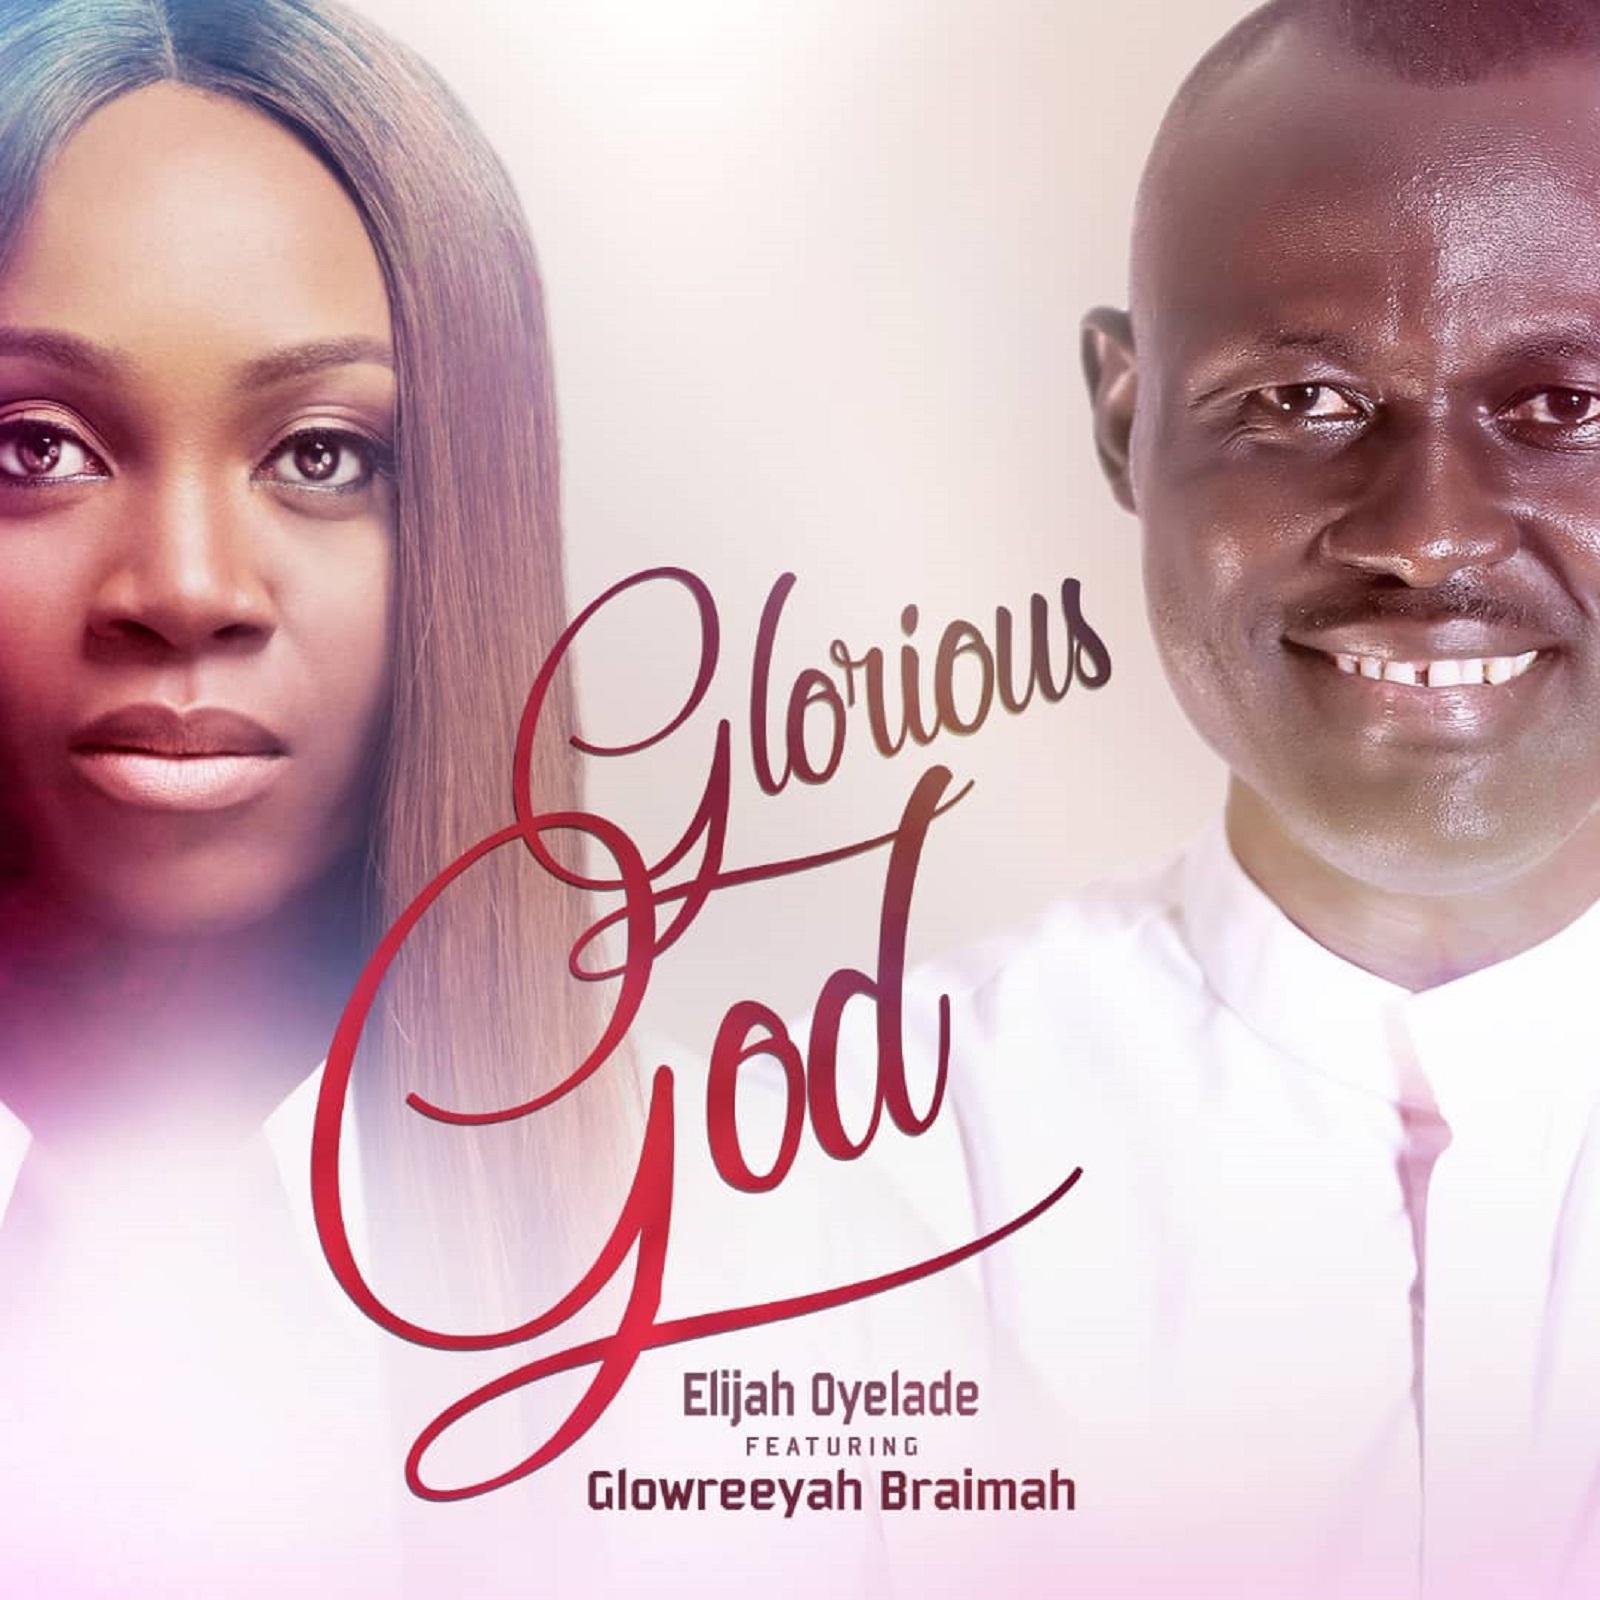 Elijah Oyelade - Glorious God Remix featuring Glowreeyah Braimah